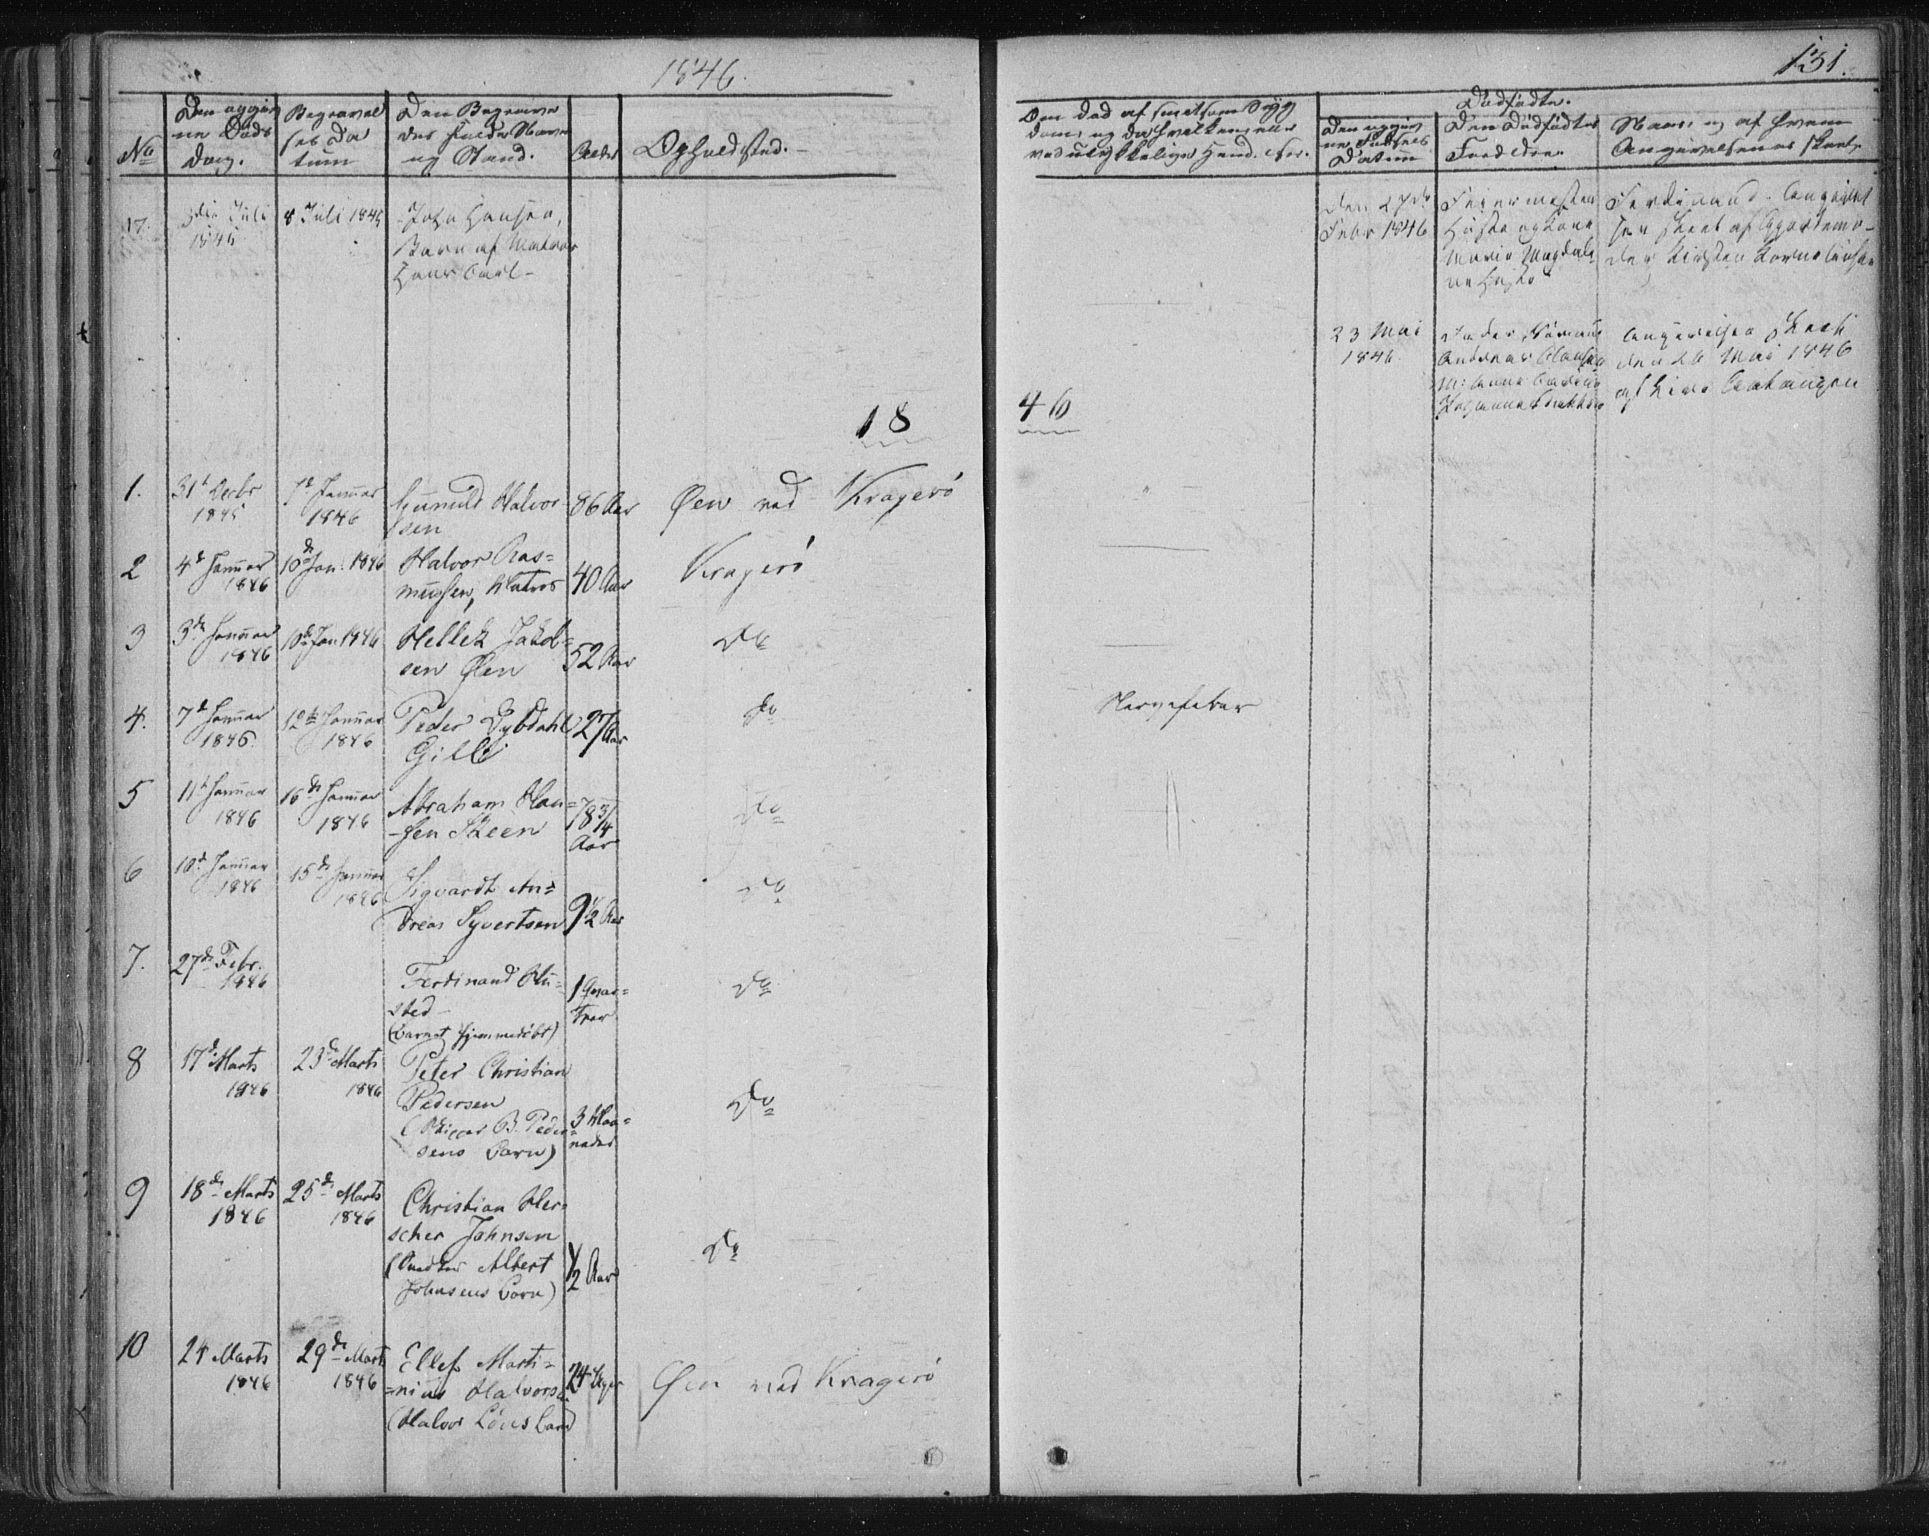 SAKO, Kragerø kirkebøker, F/Fa/L0005: Ministerialbok nr. 5, 1832-1847, s. 131